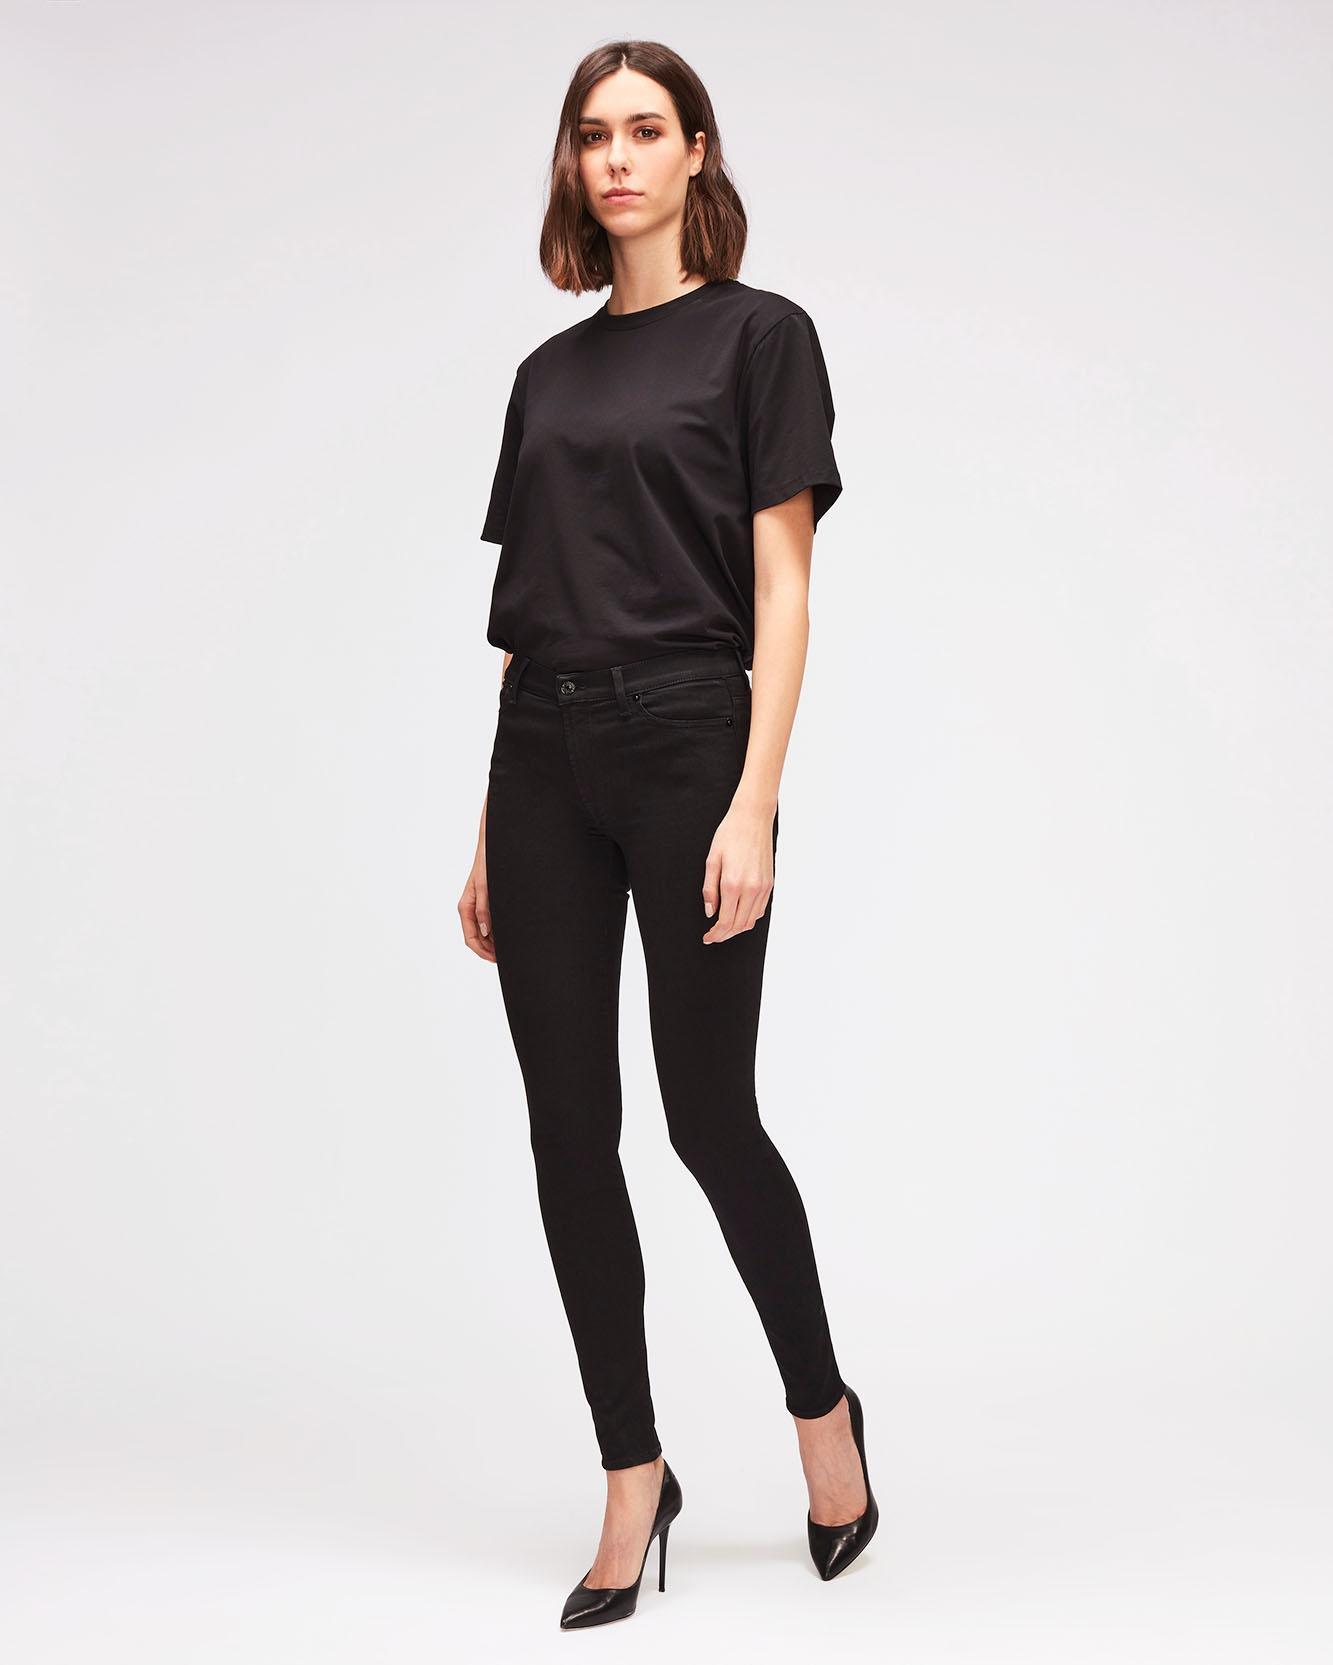 Womens Tight Fit Tapered Stretch High Waist Denim Jeans Black 10-12